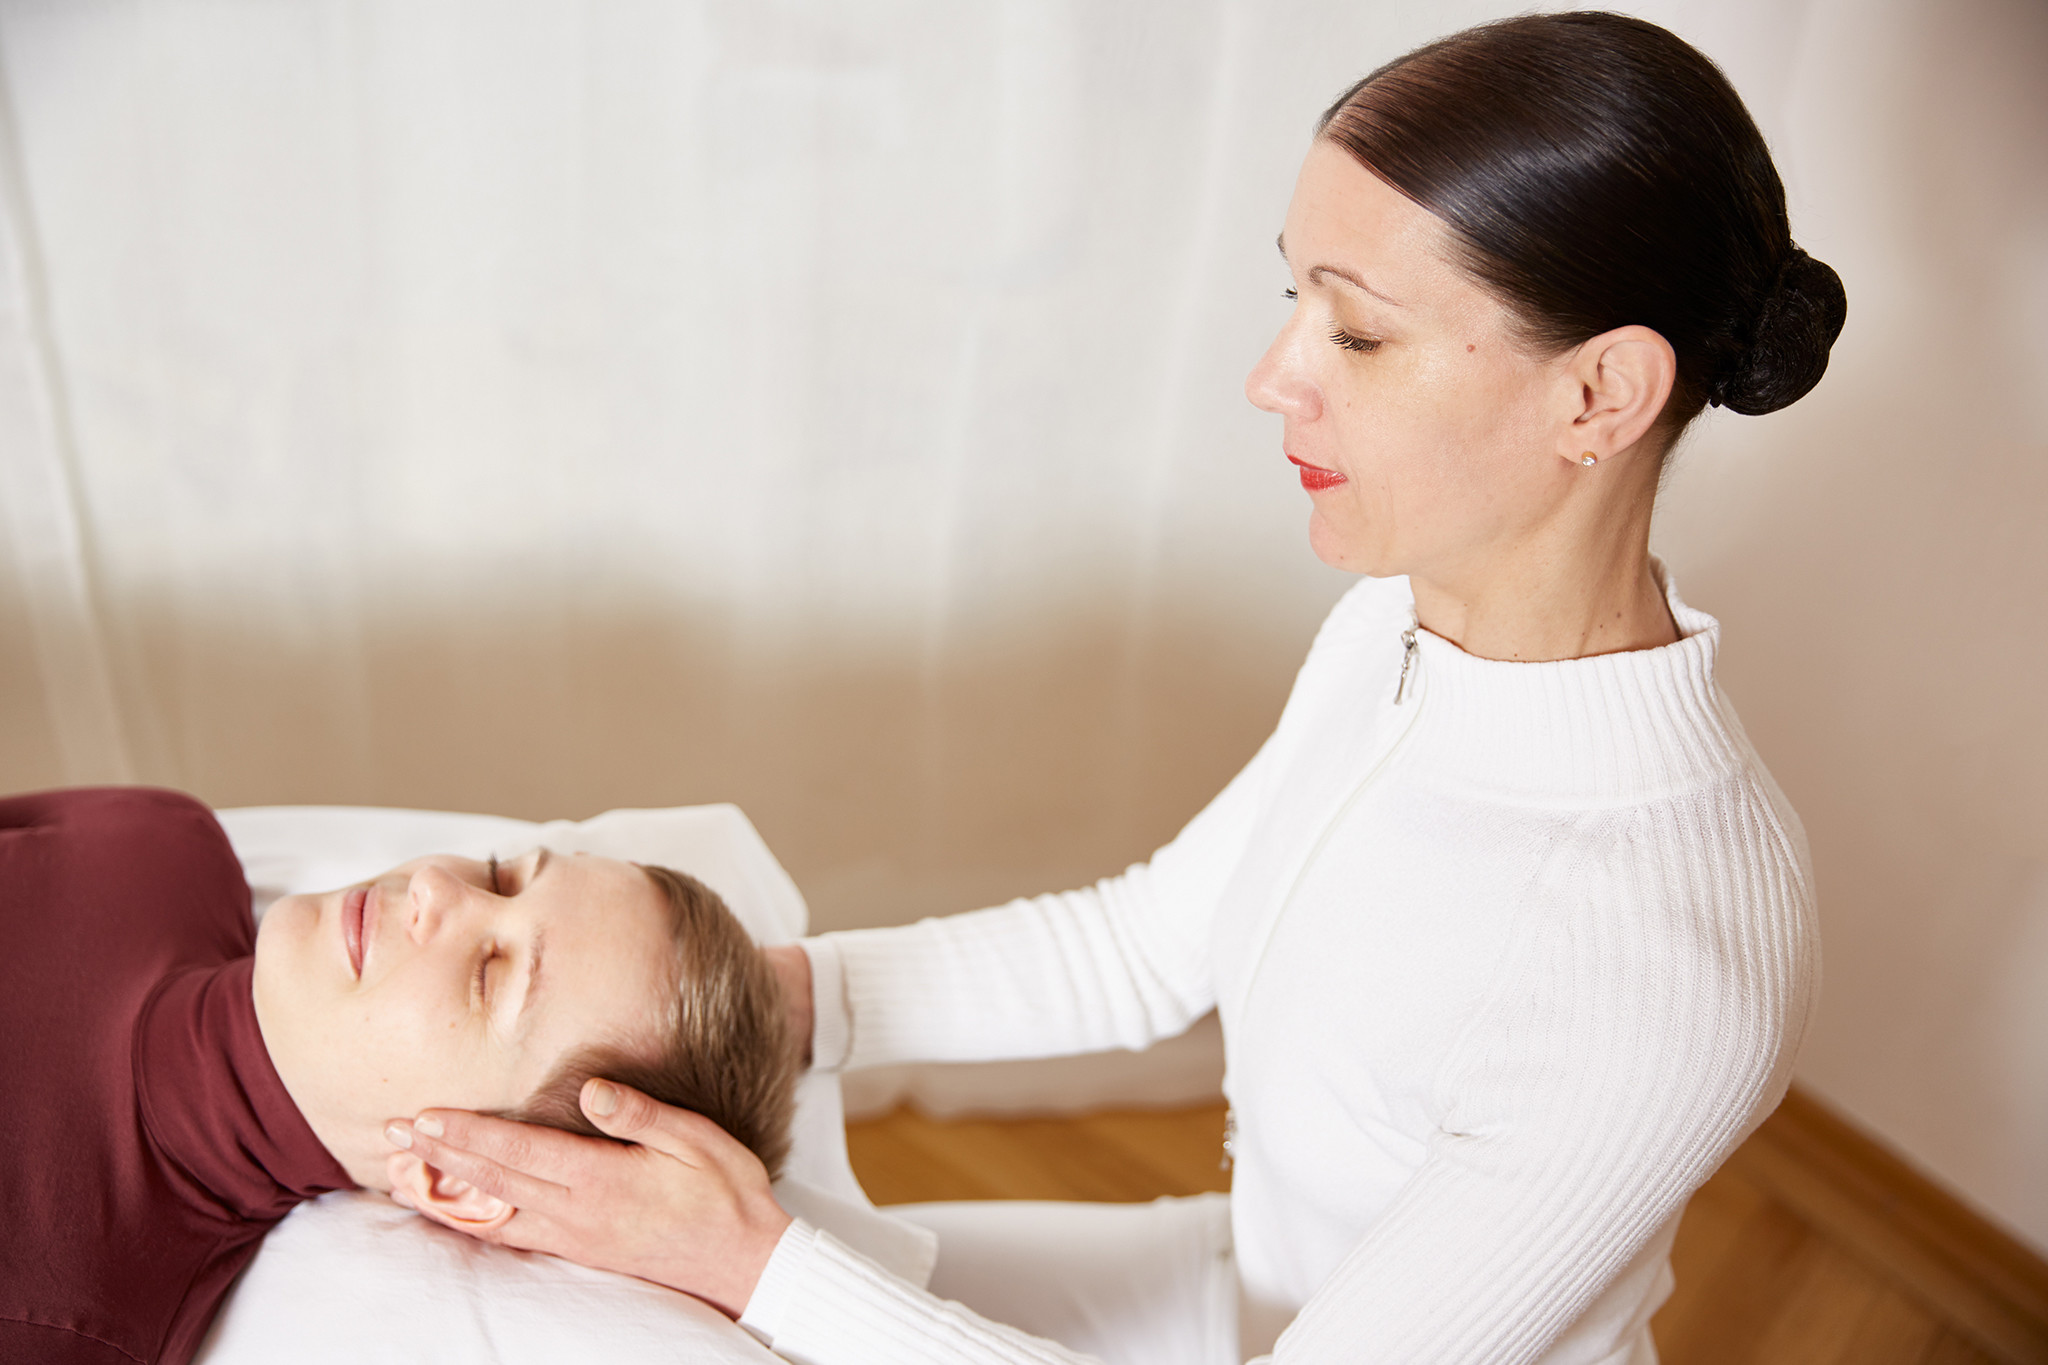 Chraniosacrale Therapie | Cornelia Becker. Praxis für Physiotherapie, Fotocredit: Julia Spicker